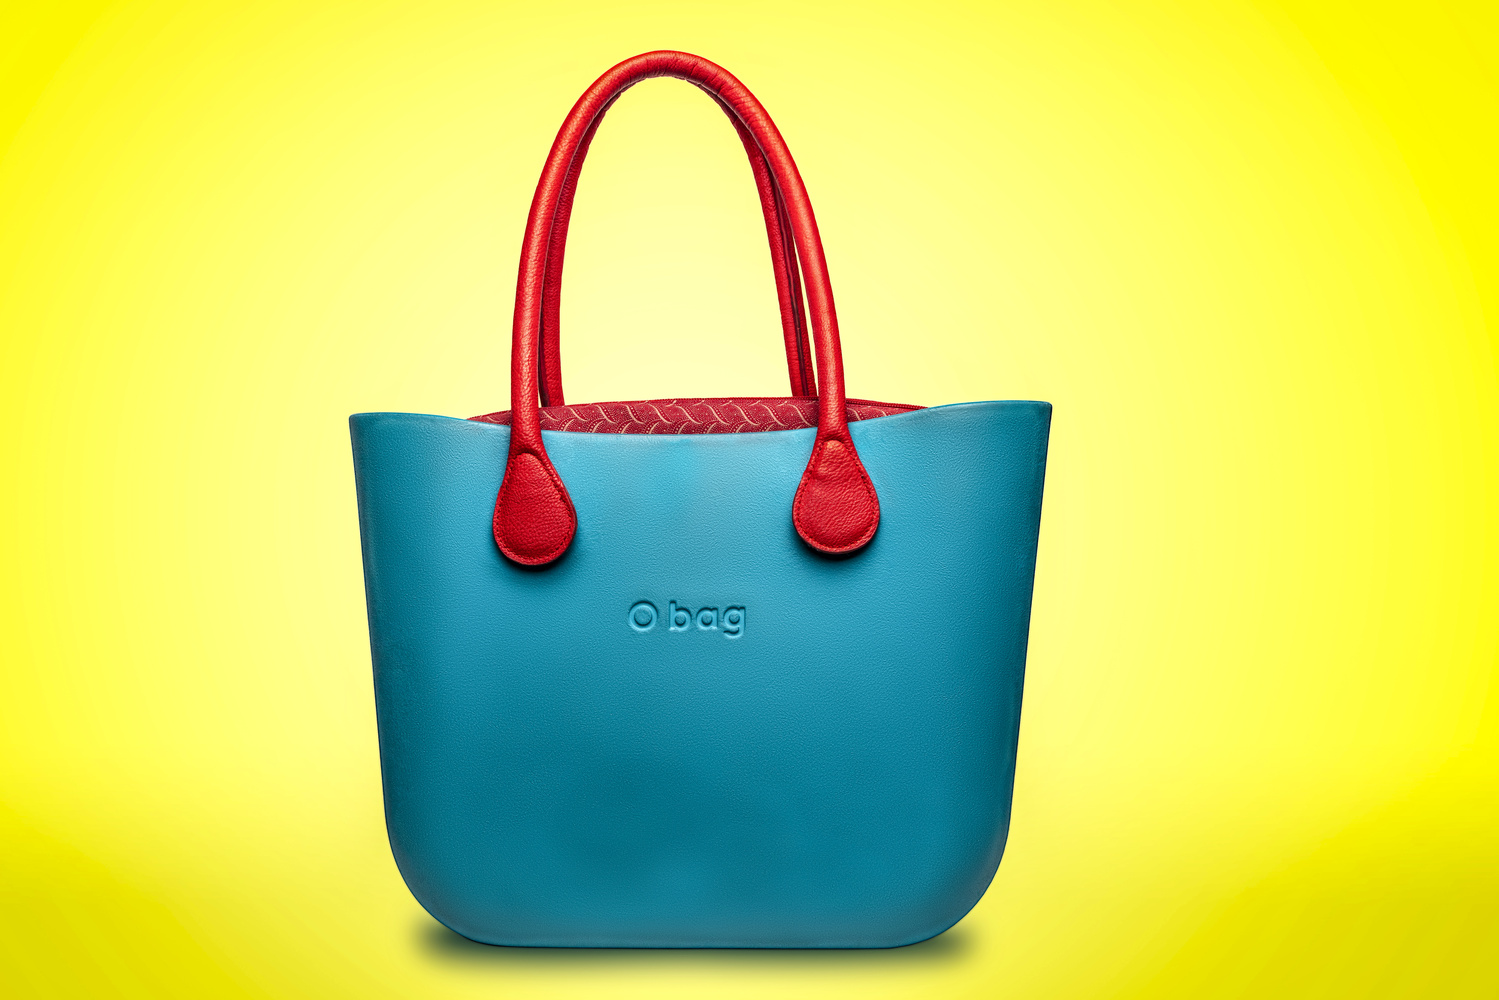 O bag by Roberto González